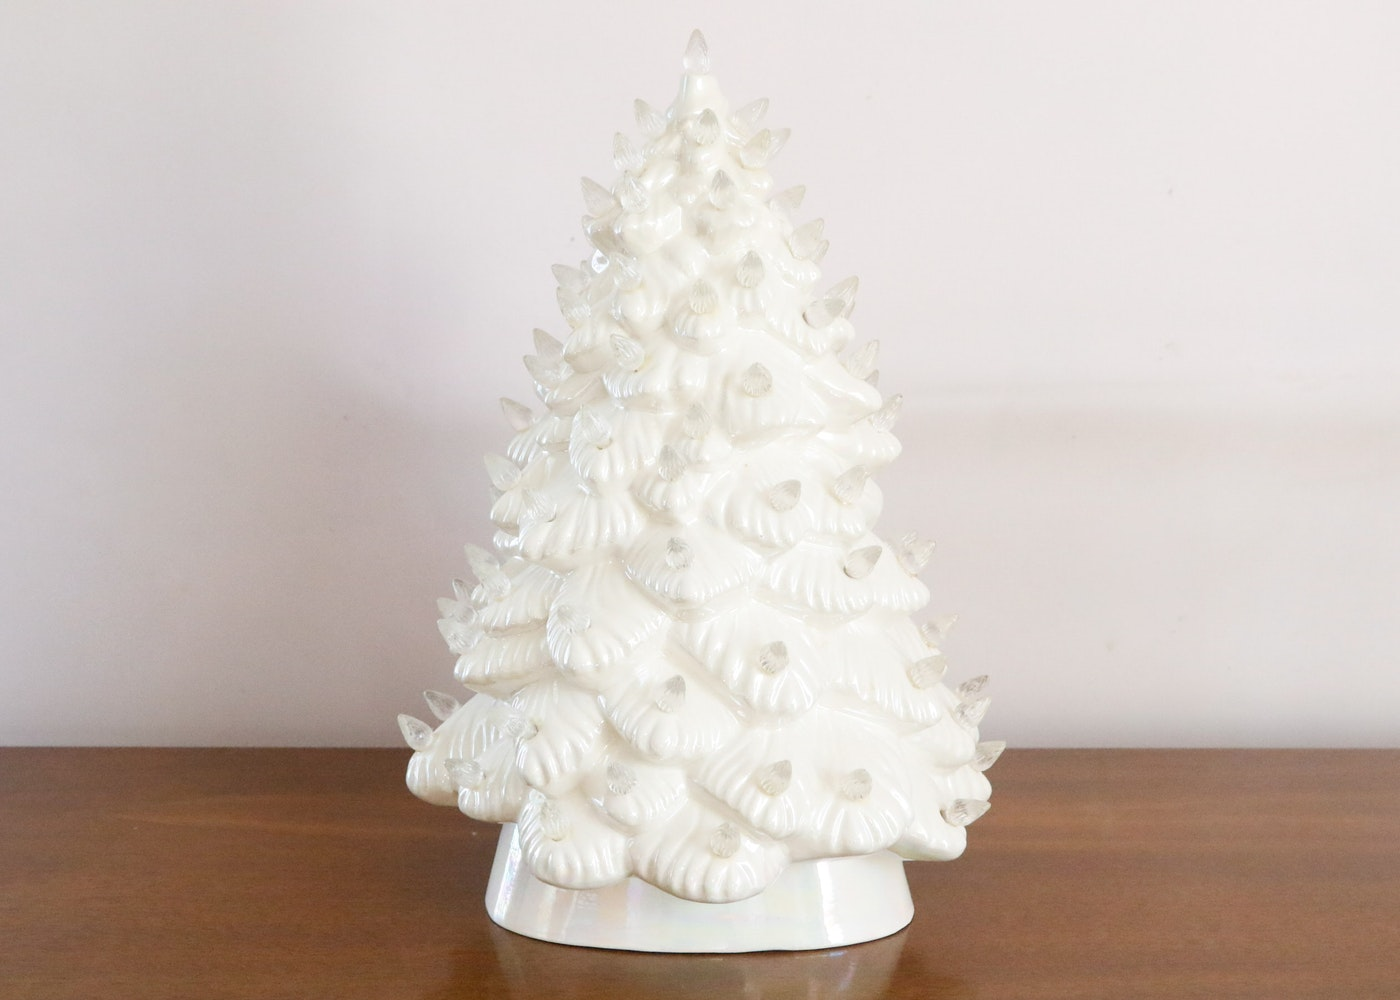 Atlantic Mold Ceramic Lighted Christmas Tree